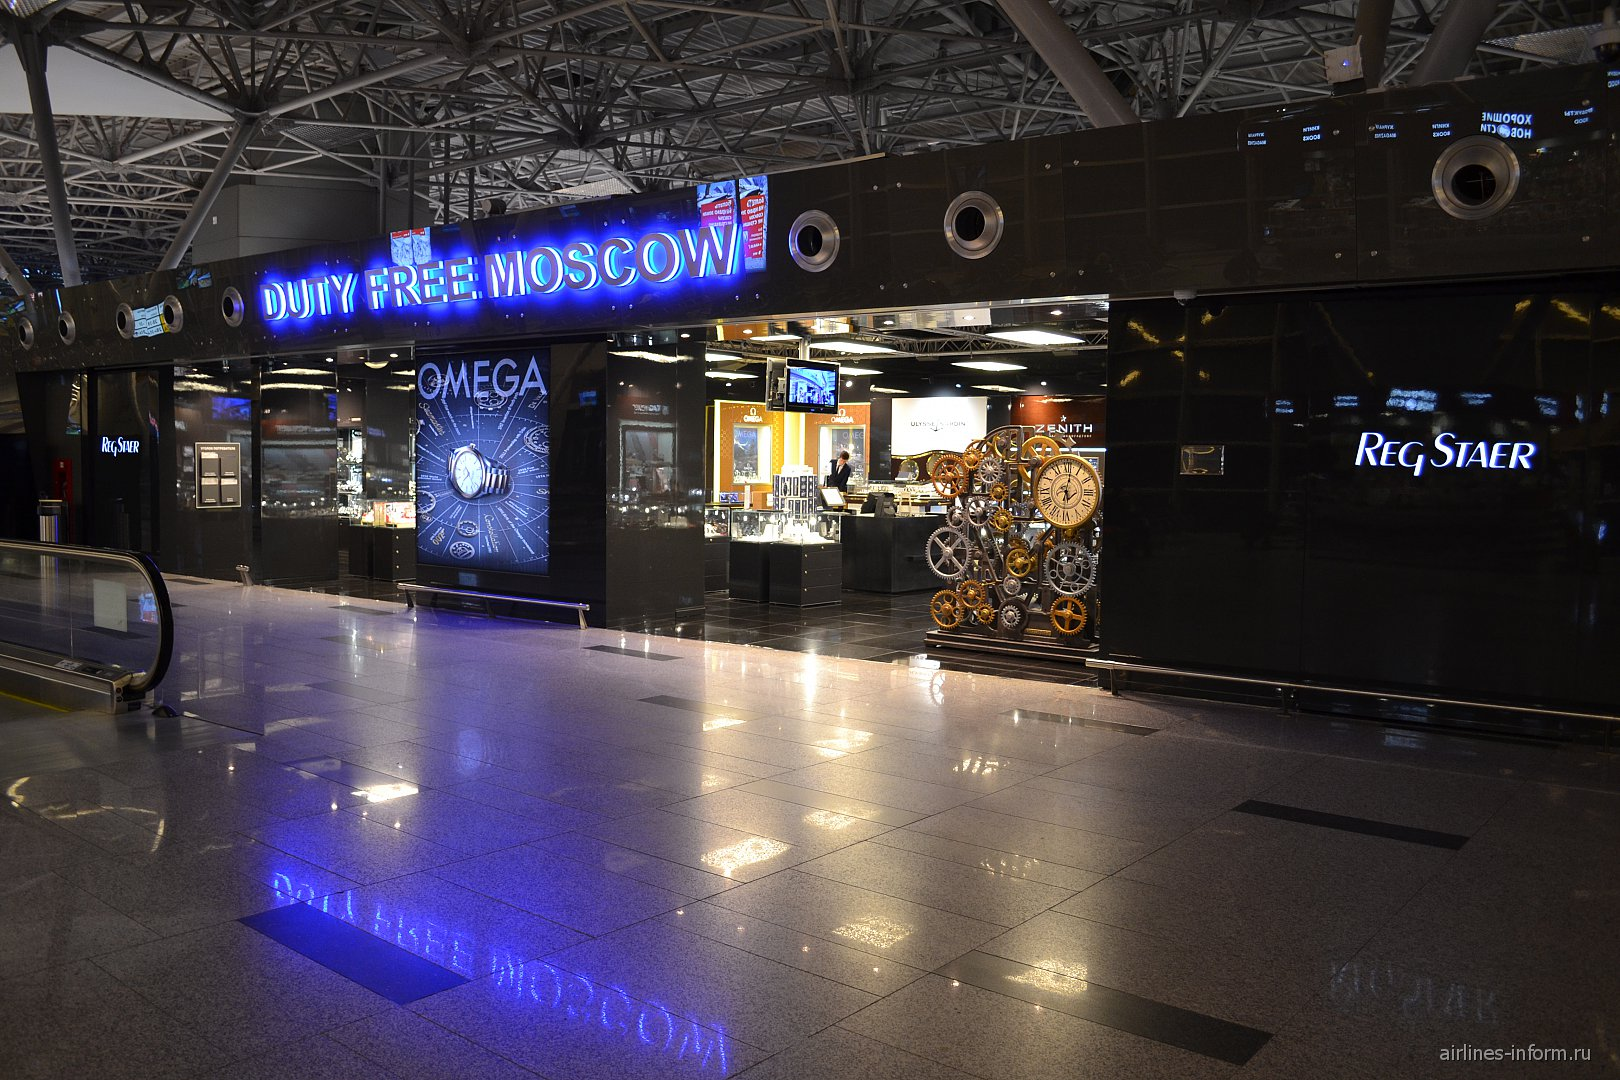 Магазин Duty-Free в чистой зоне Терминала А аэропорта Внуково